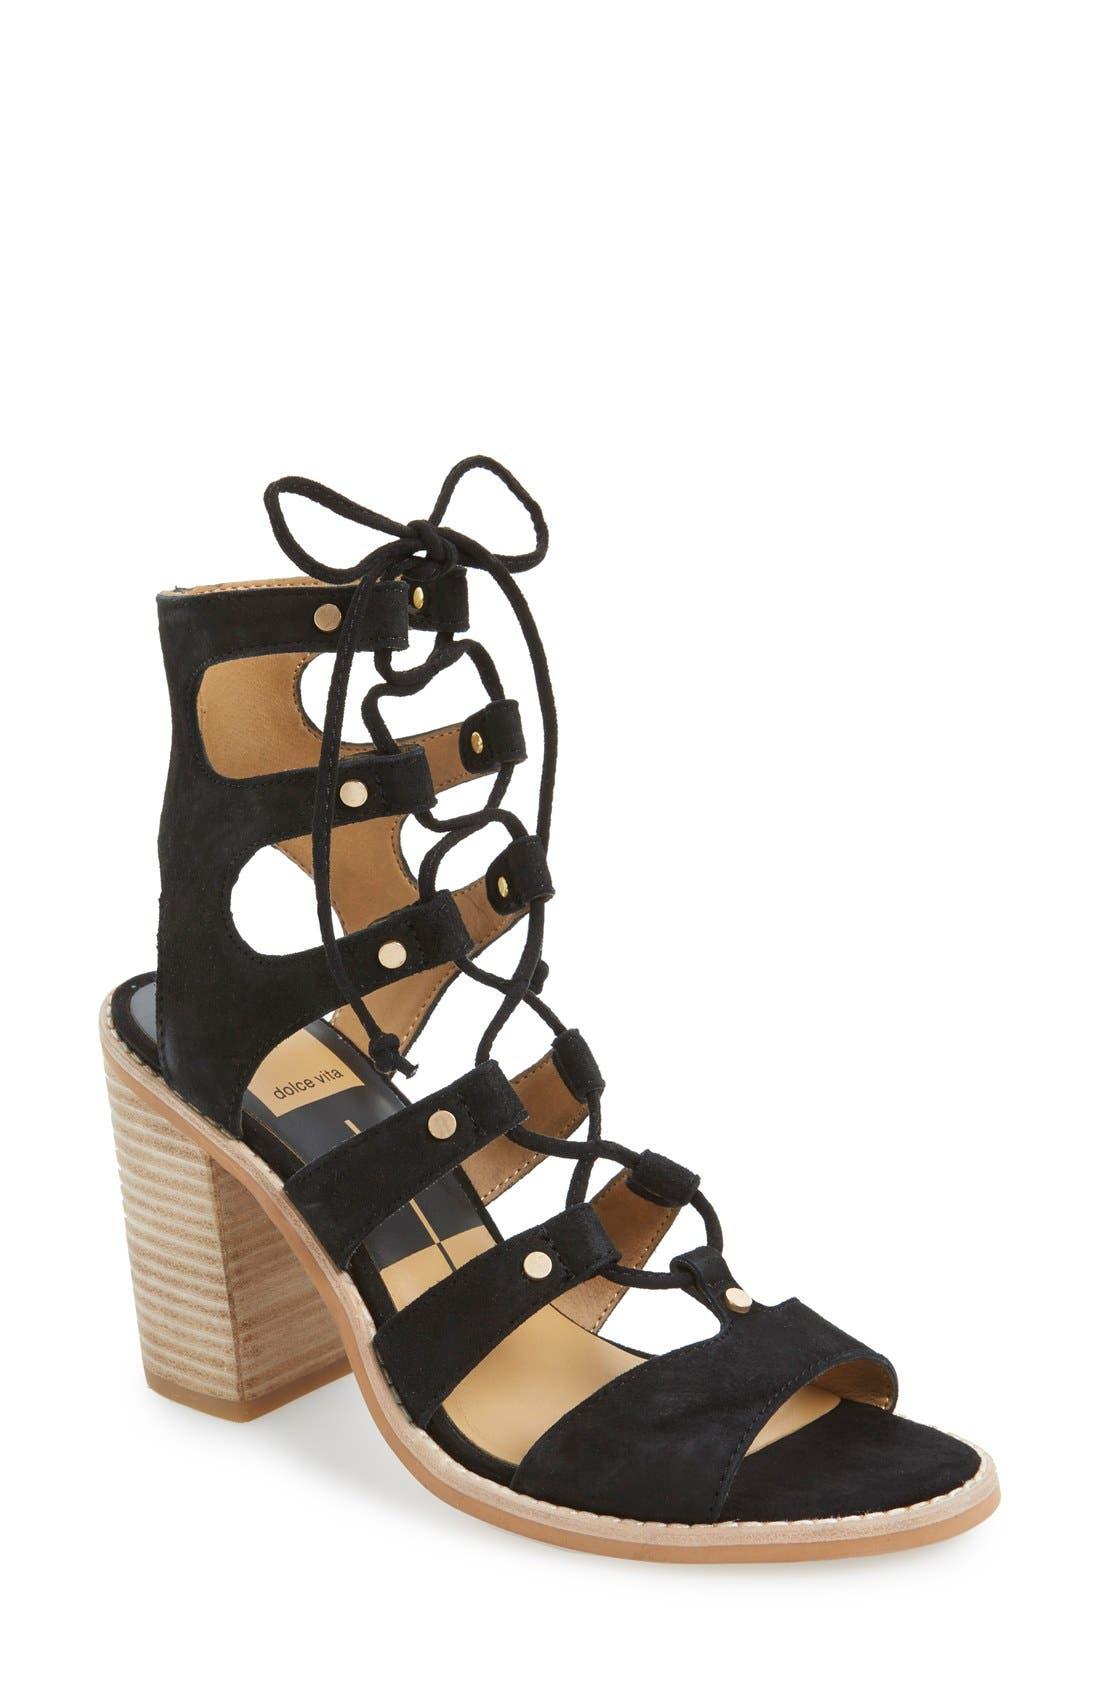 Alternate Image 1 Selected - Dolce Vita 'Lyndon' Lace-Up Sandal (Women)